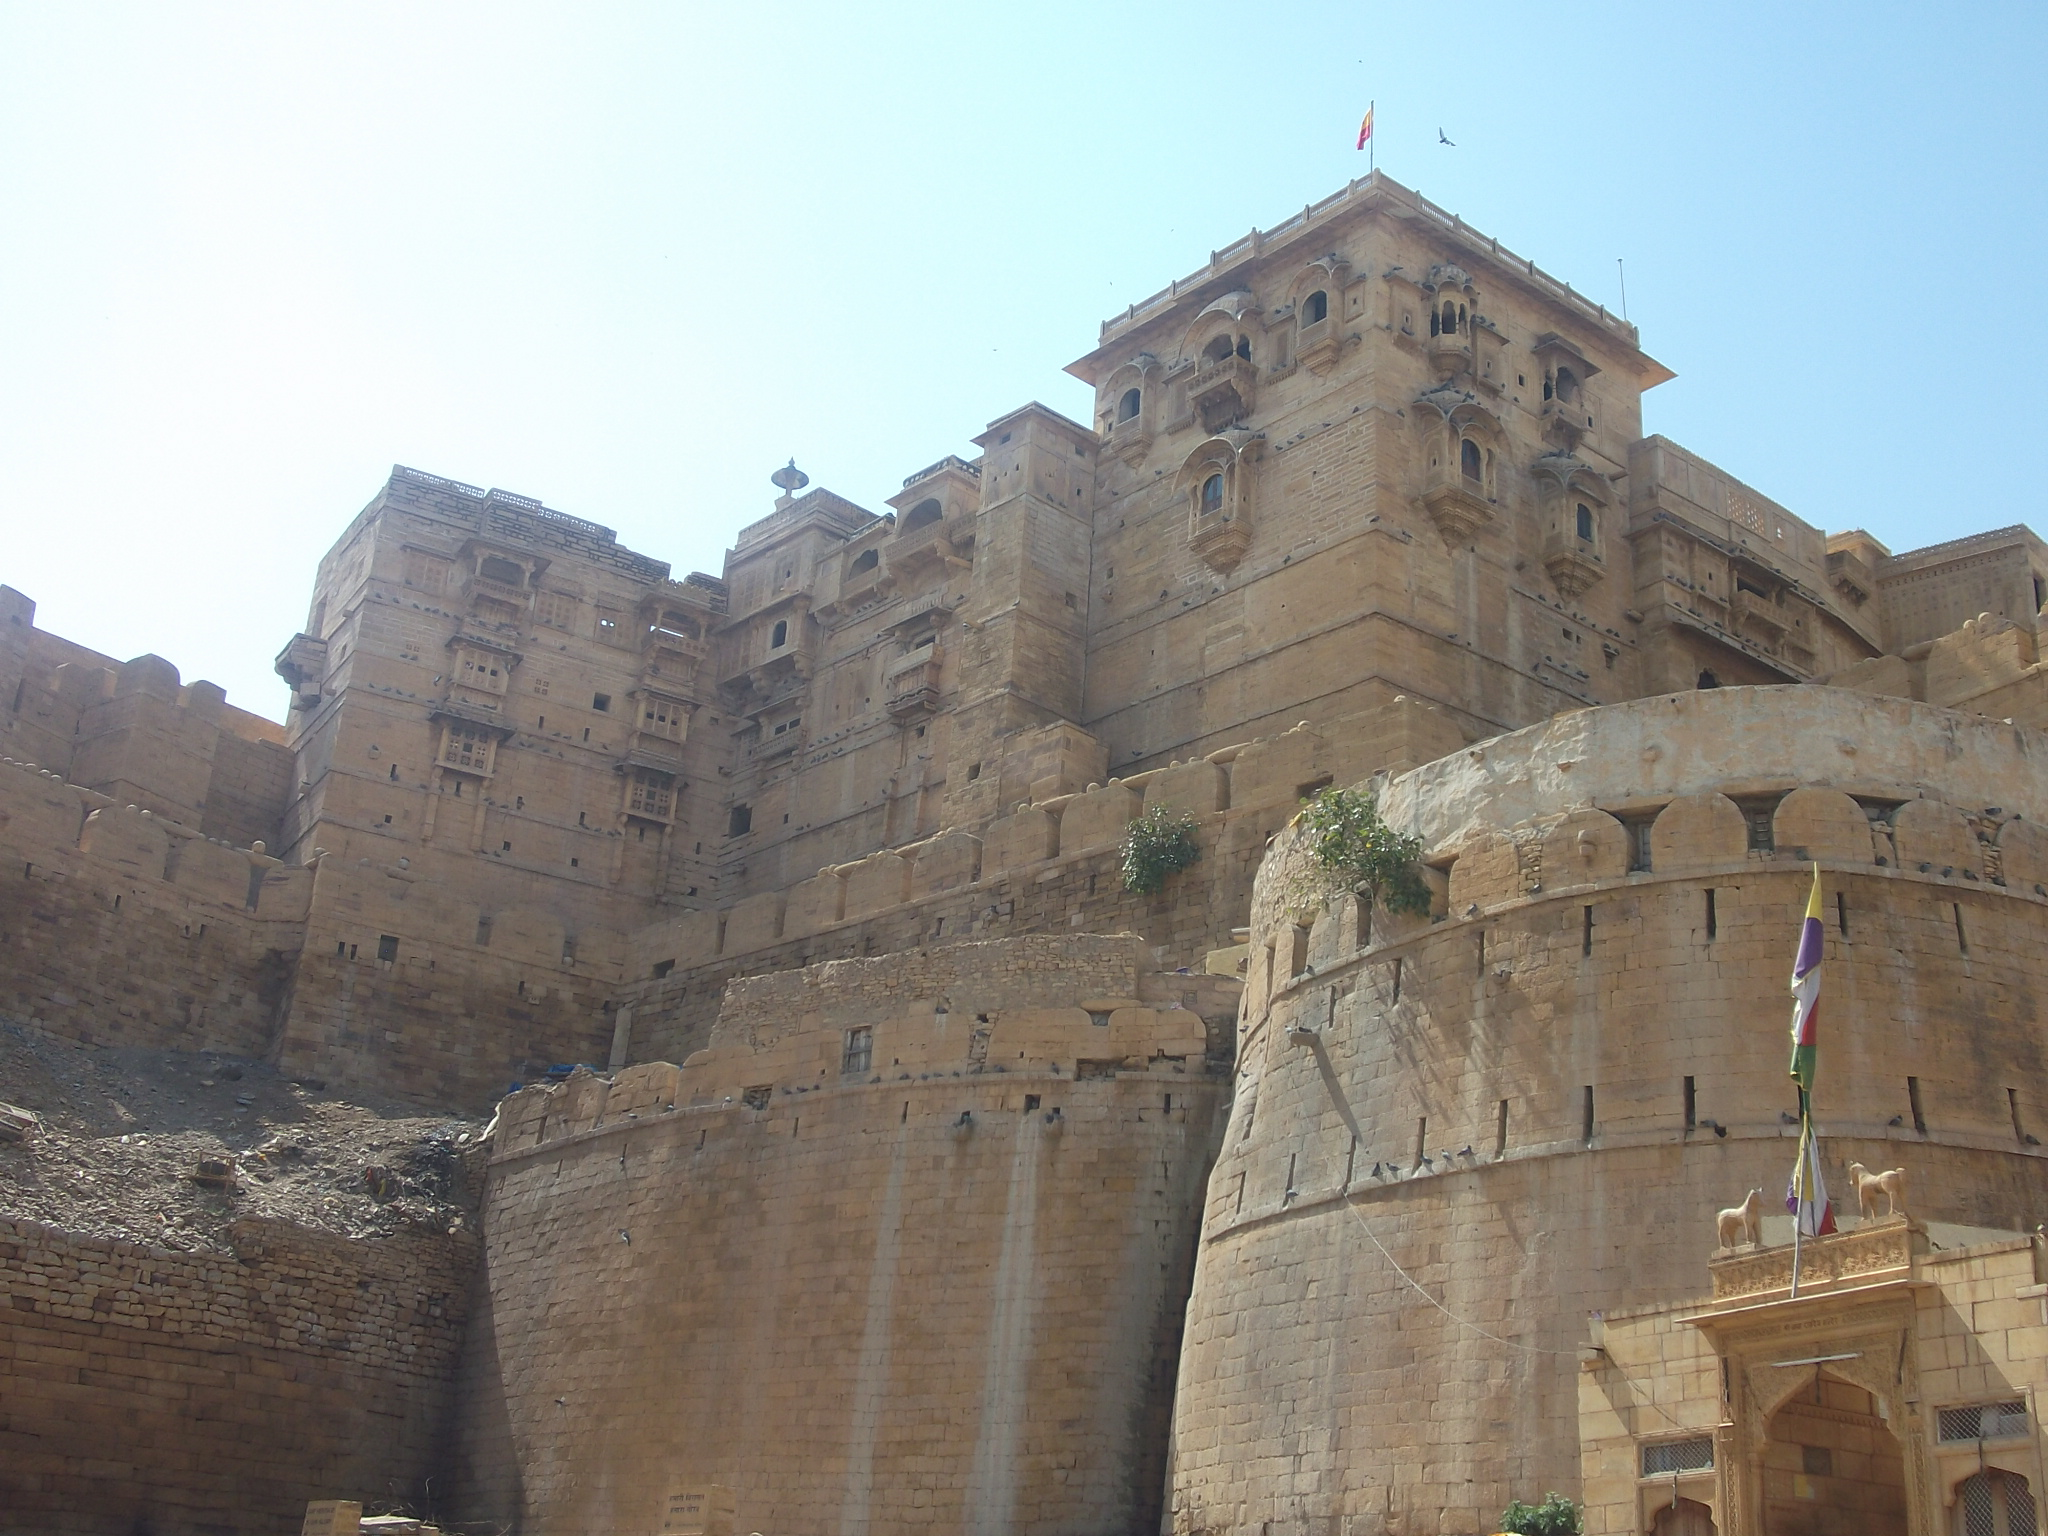 Casas sobre la muralla de Jaisalmer